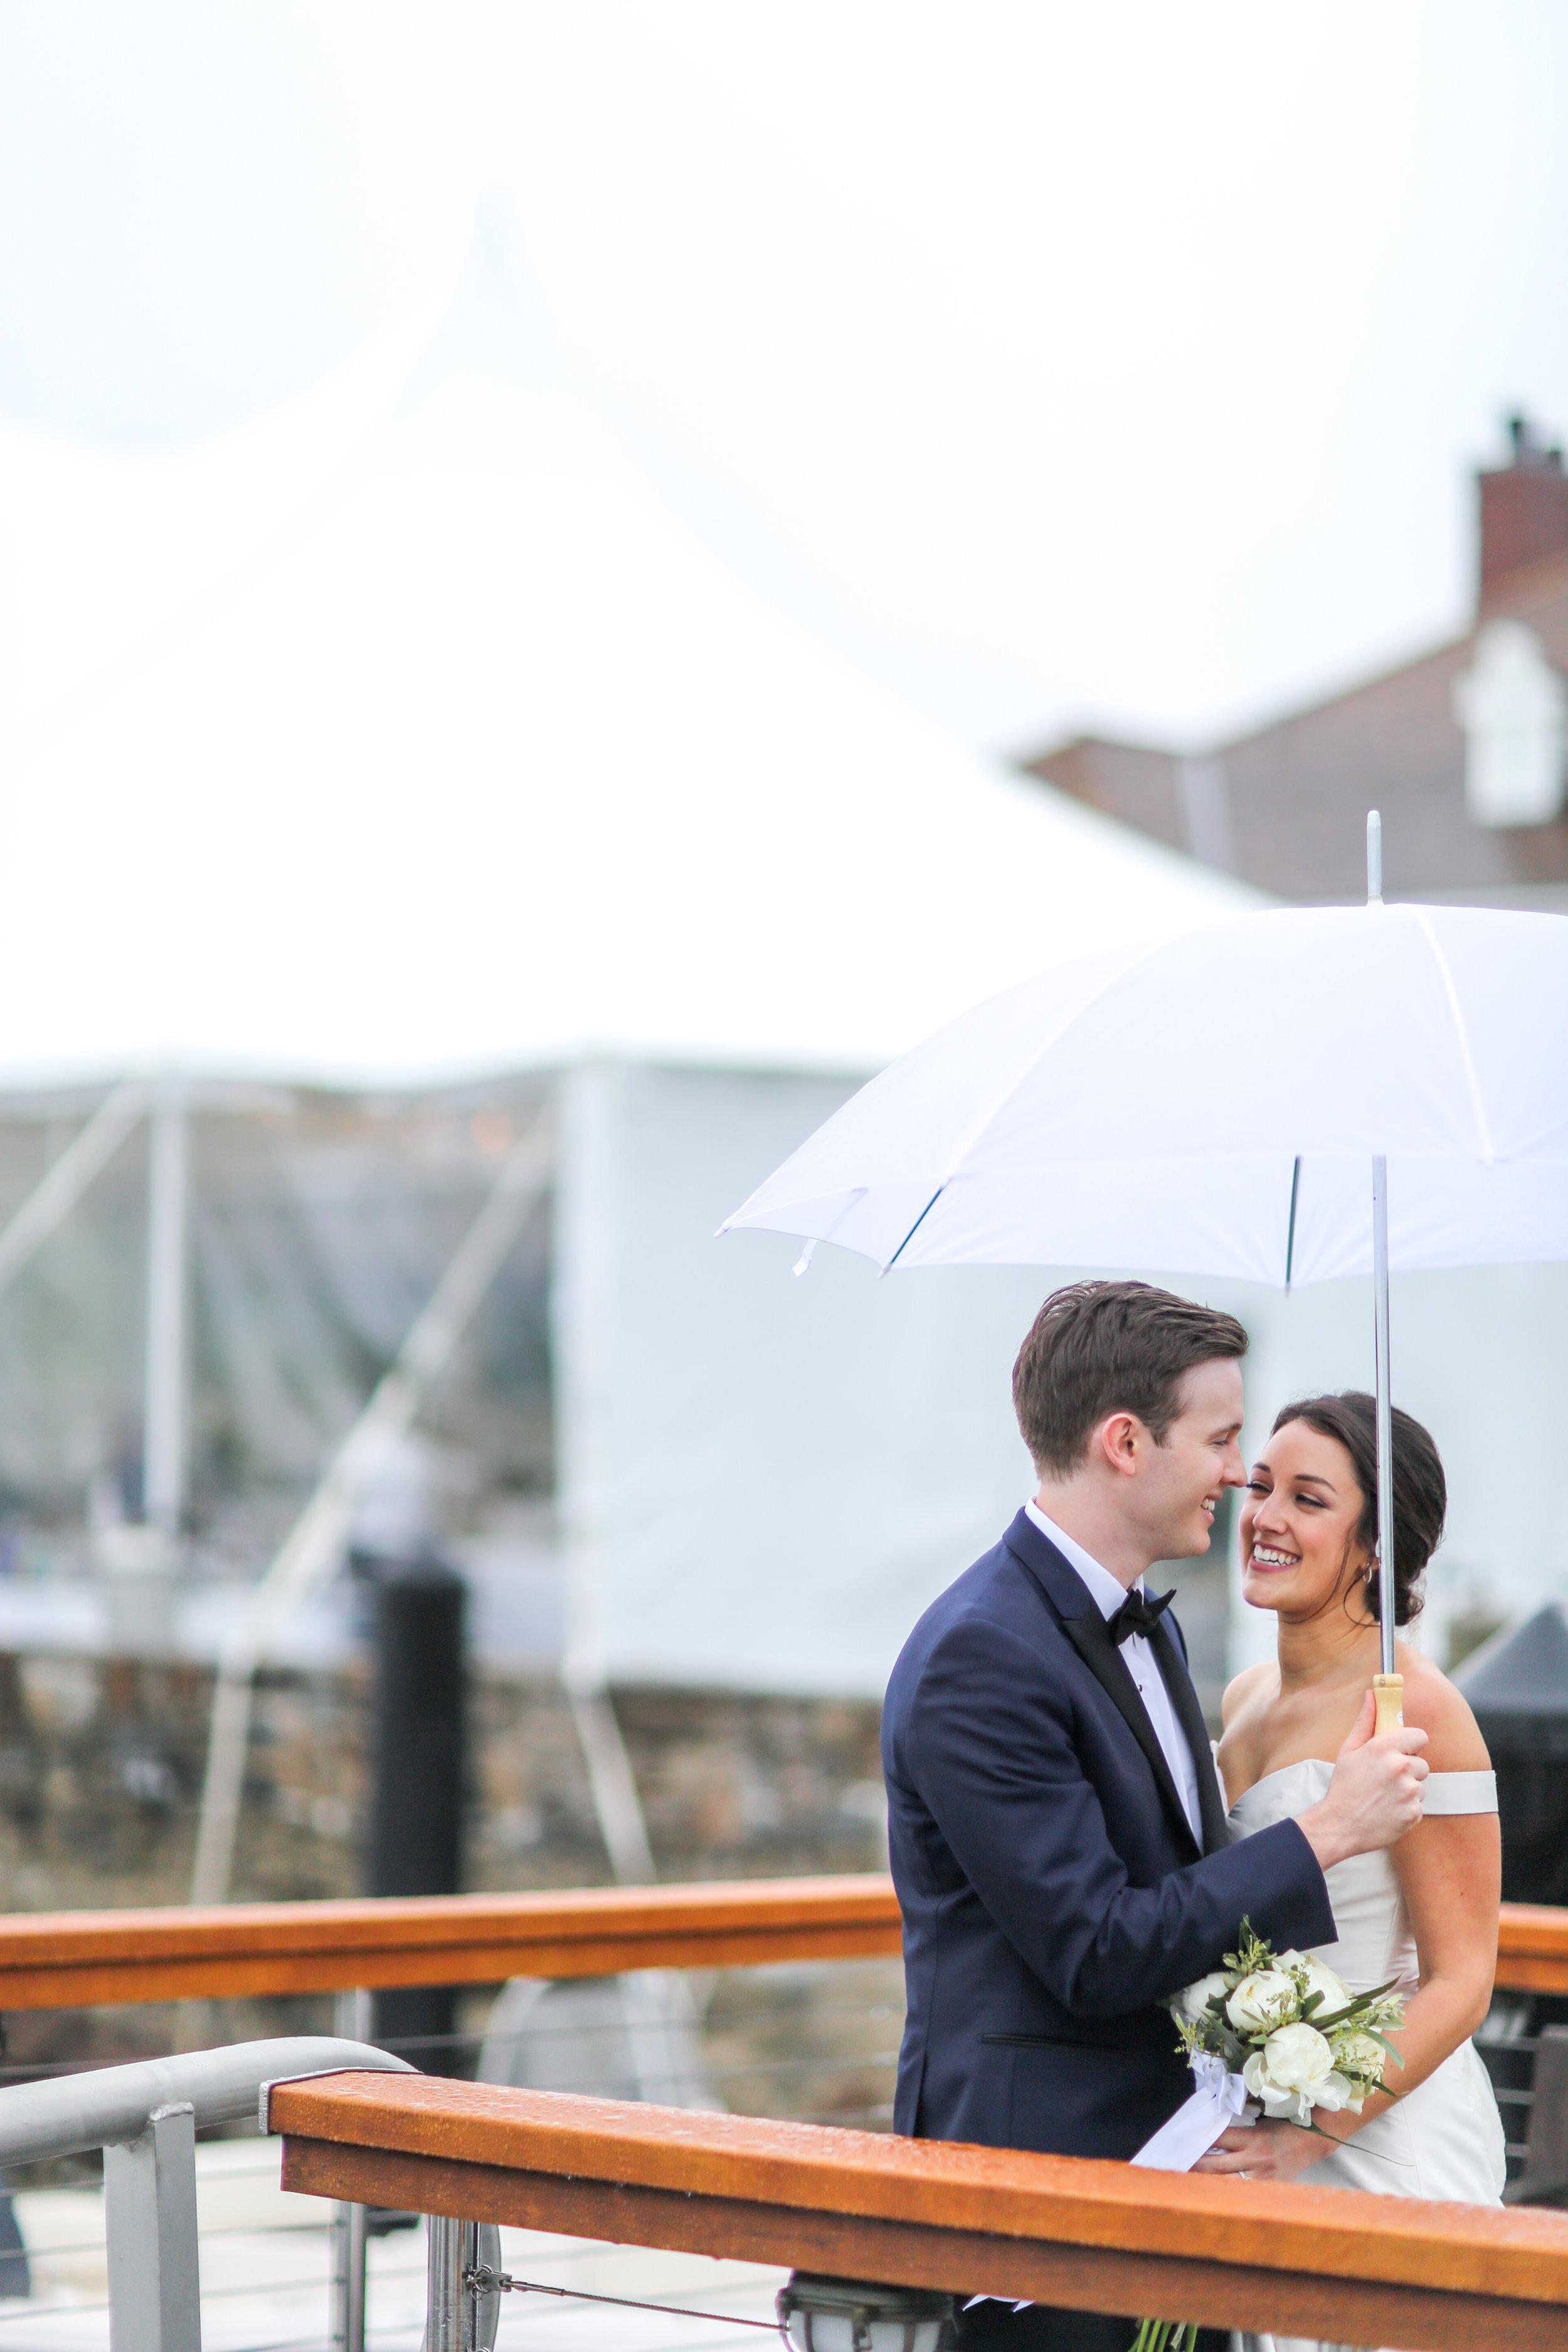 Jeremie_Barlow_Photography_Steffen_Sudyam_wedding_2018-683.jpg